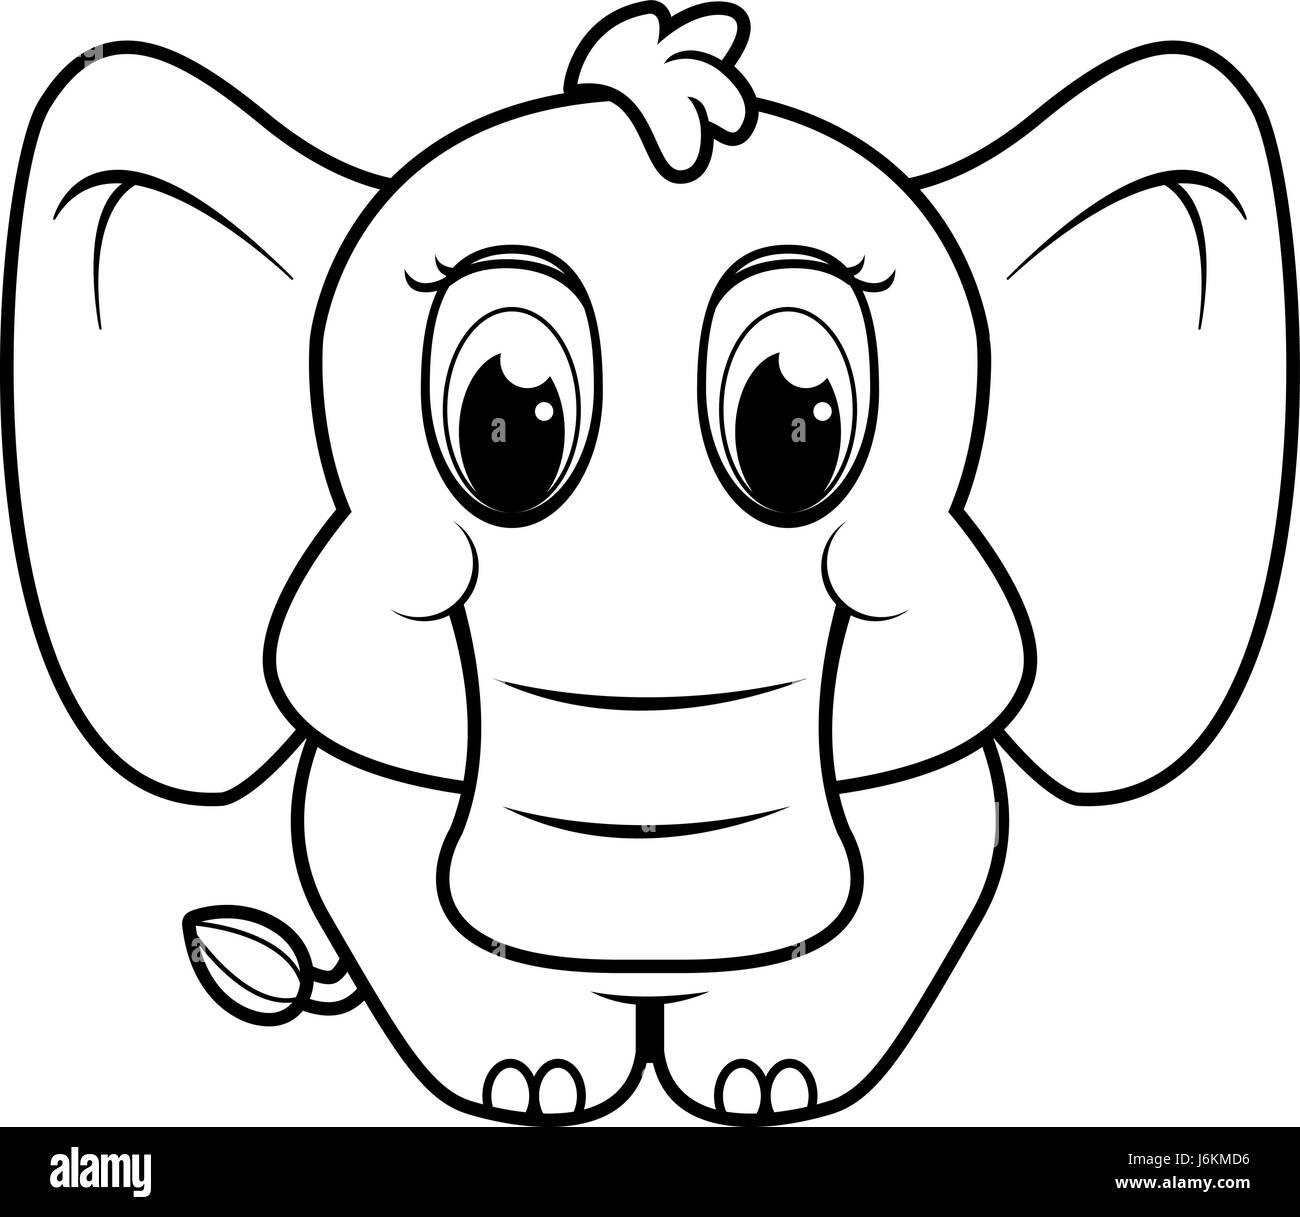 a baby cartoon elephant standing on four legs stock vector art